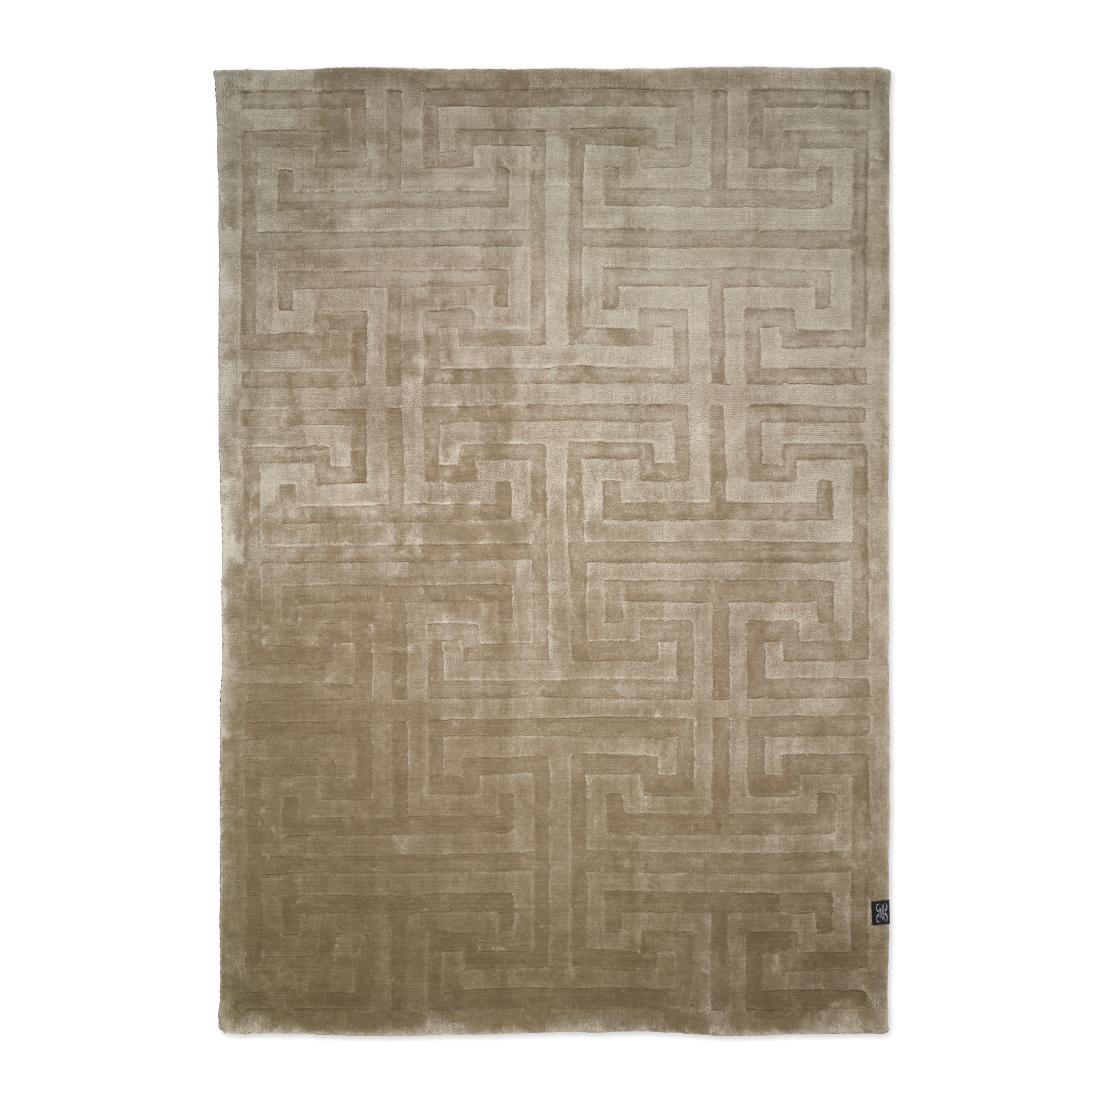 Viskosmatta KEY taupe 170 x 230 cm, Classic Collection